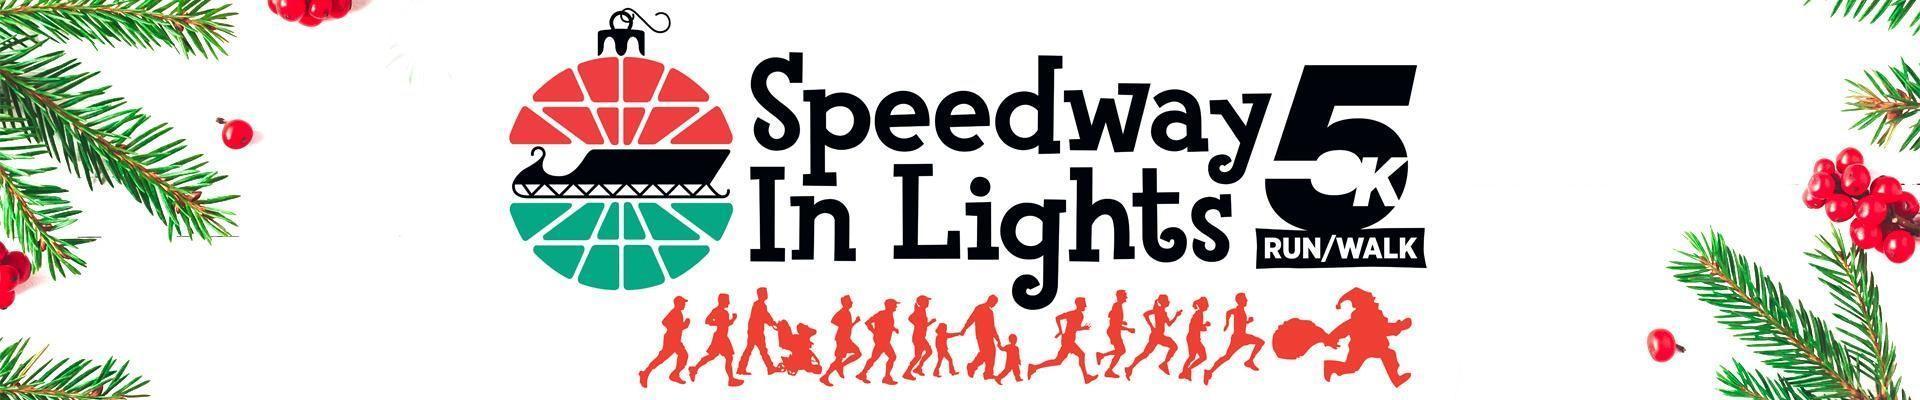 Speedway in Lights 5k Registration Header